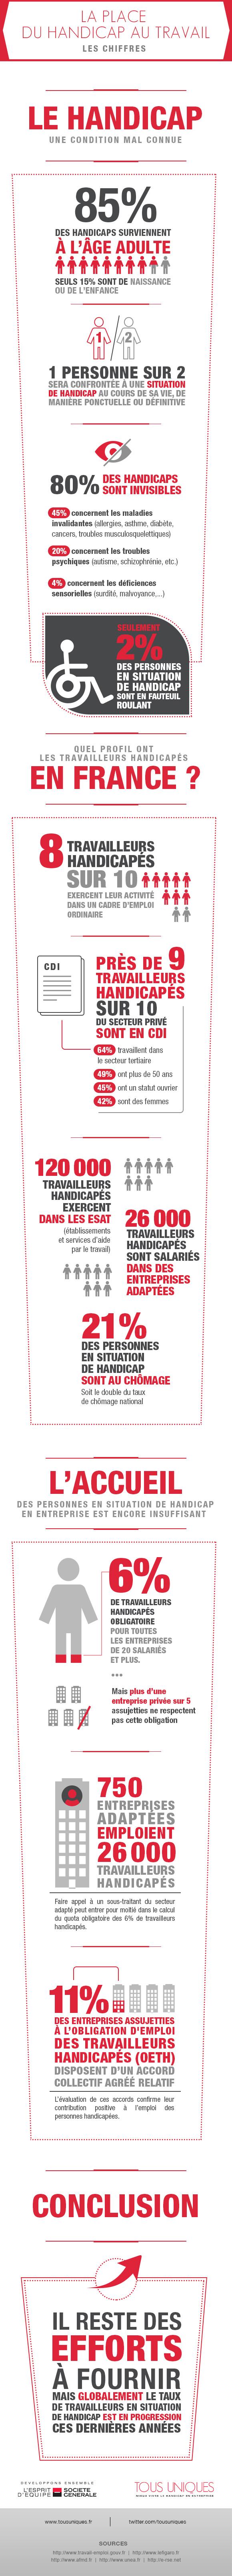 Infographie travail handicap